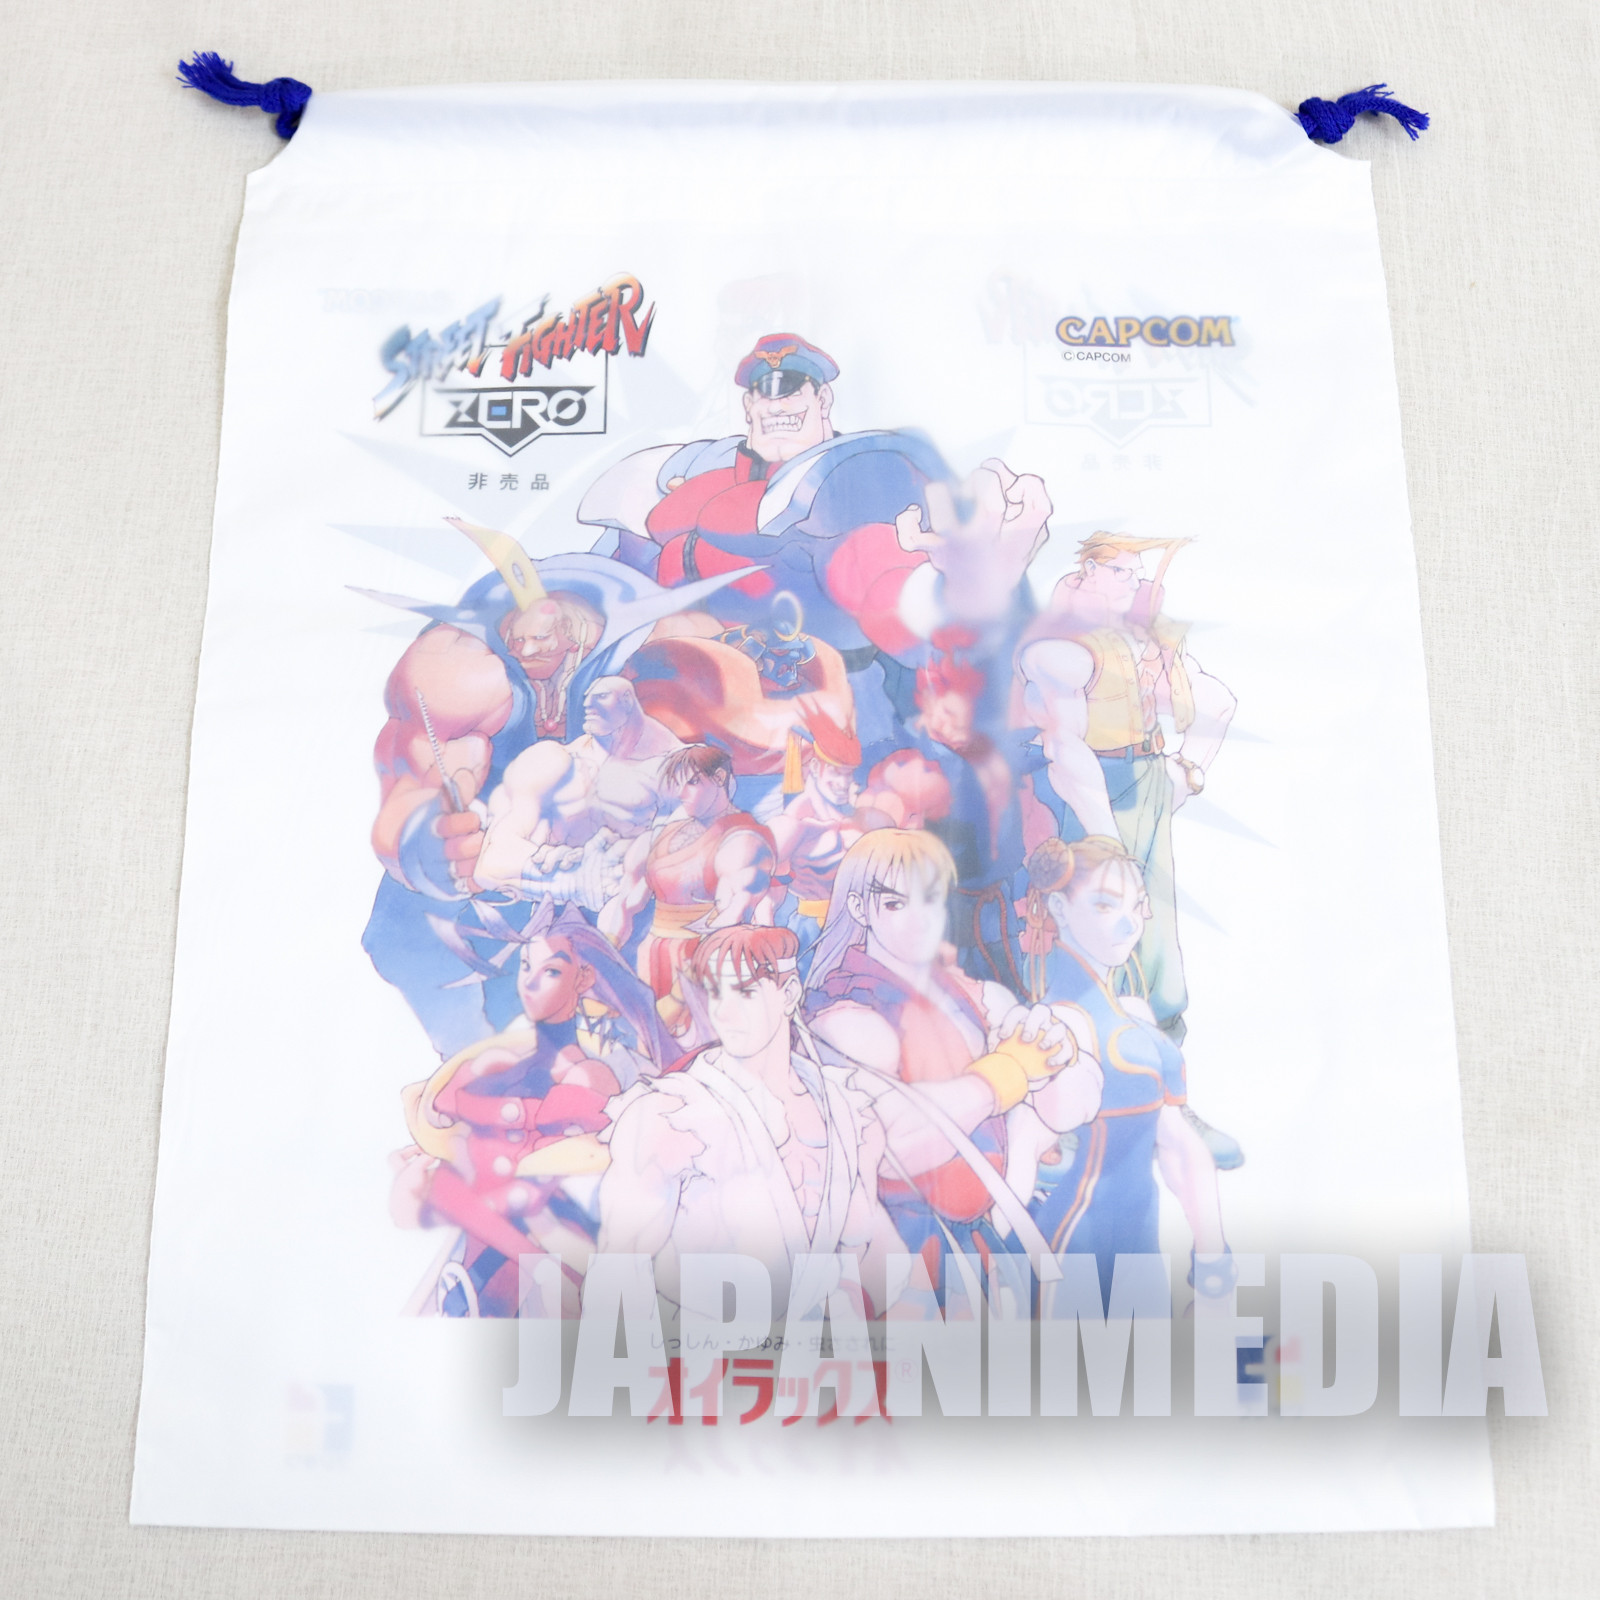 Street Fighter Zero Promotion Vinyl Drawstring Bag #3 JAPAN GAME ALPHA